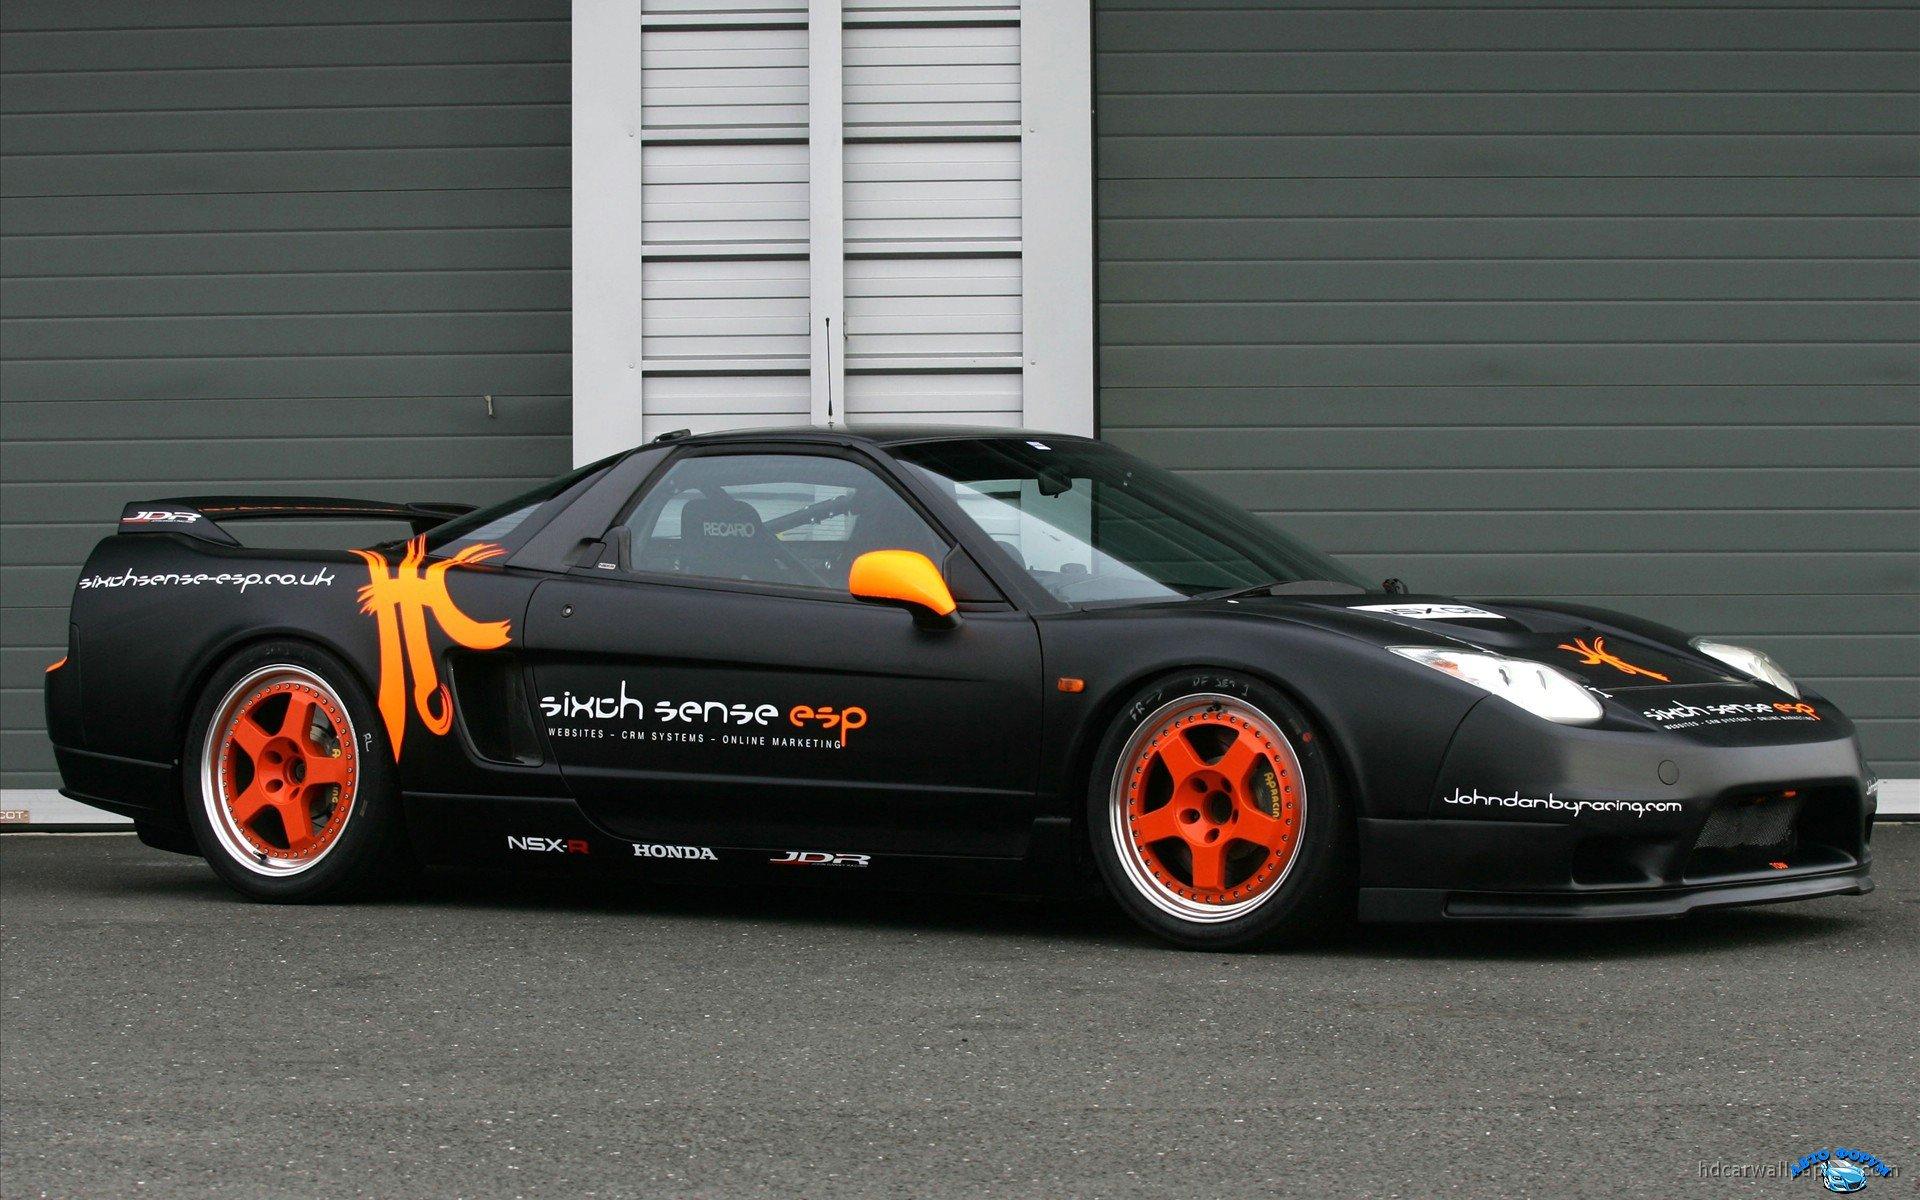 honda_nsx_by_john_danby_racing_3-wide.jpg